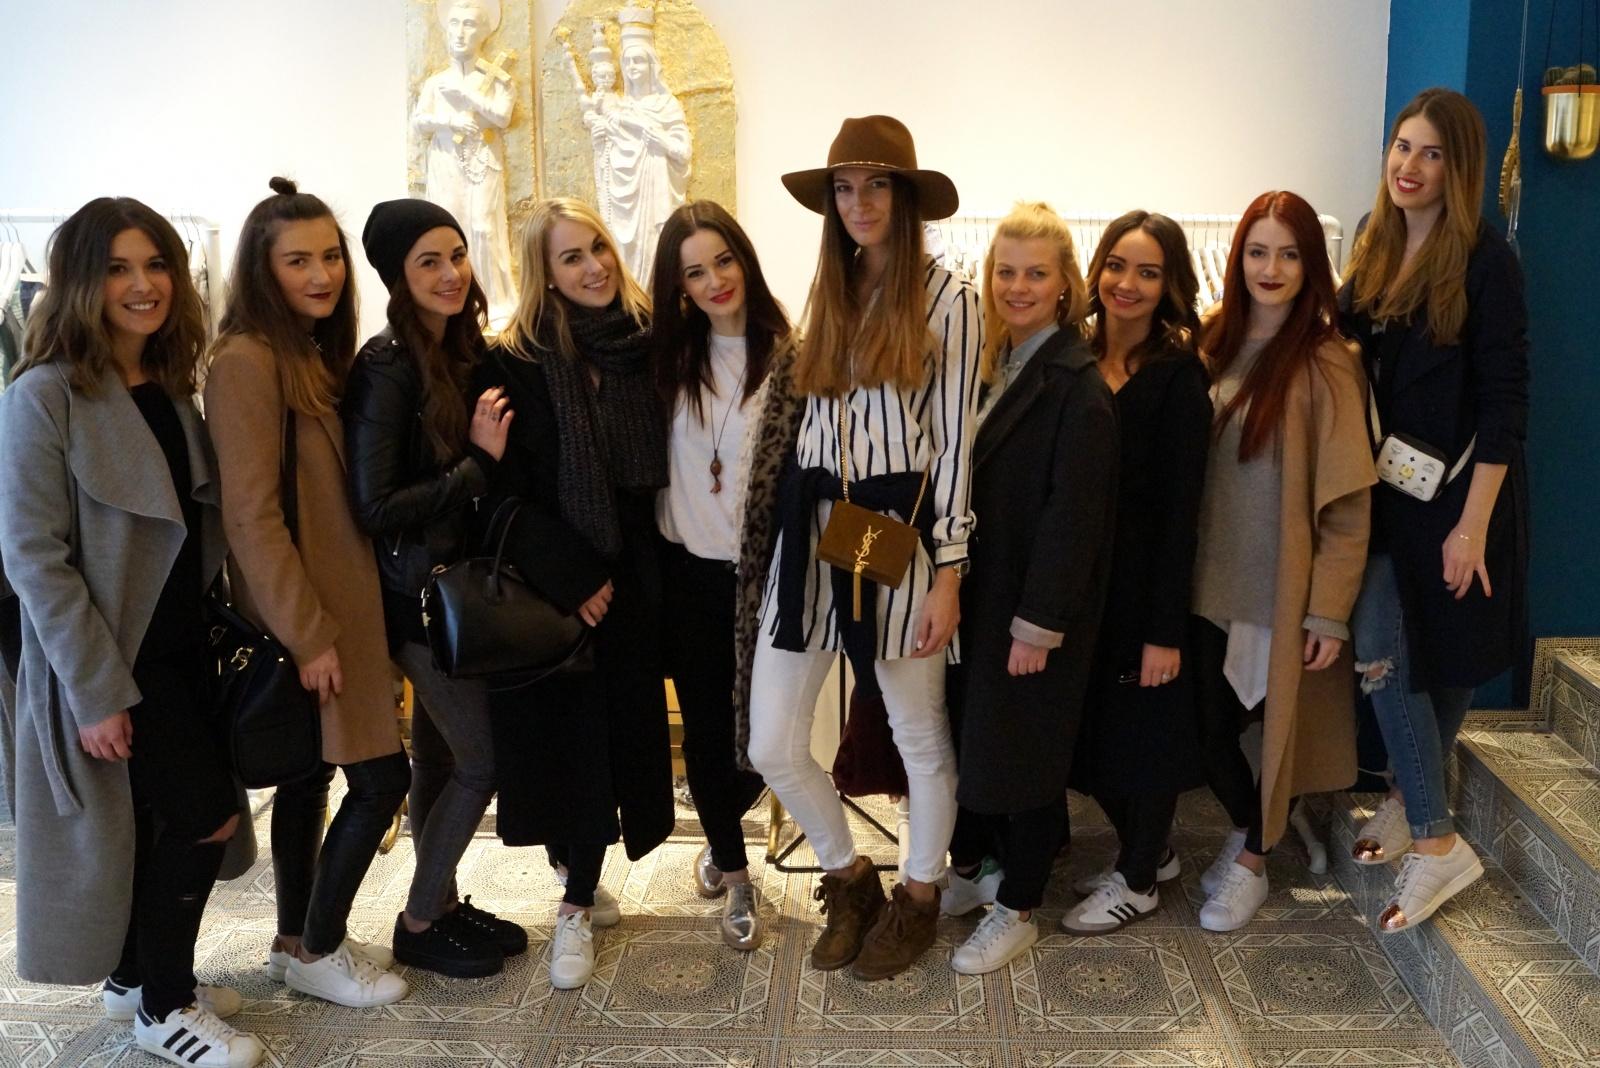 Fashioncircuz by Jenny dsc01423-1600x1068 1000 TOLLE MOMENTE!